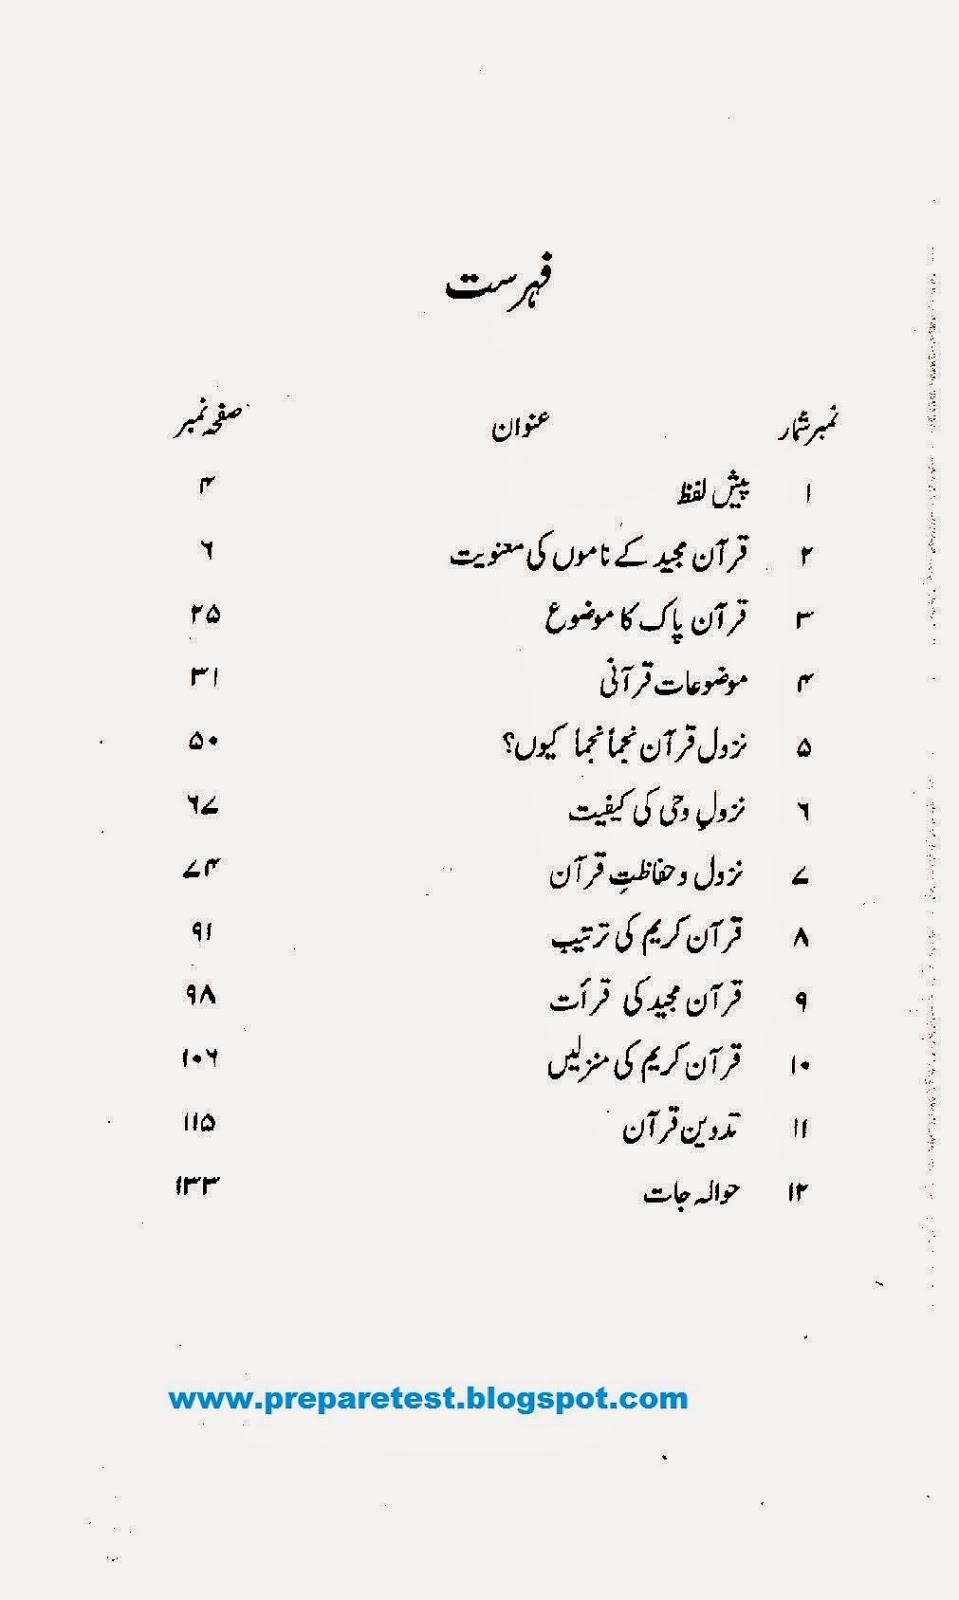 Quran Majeed Aik Taaruf By Dr Mehmood Ahmad Ghazi (r a) free